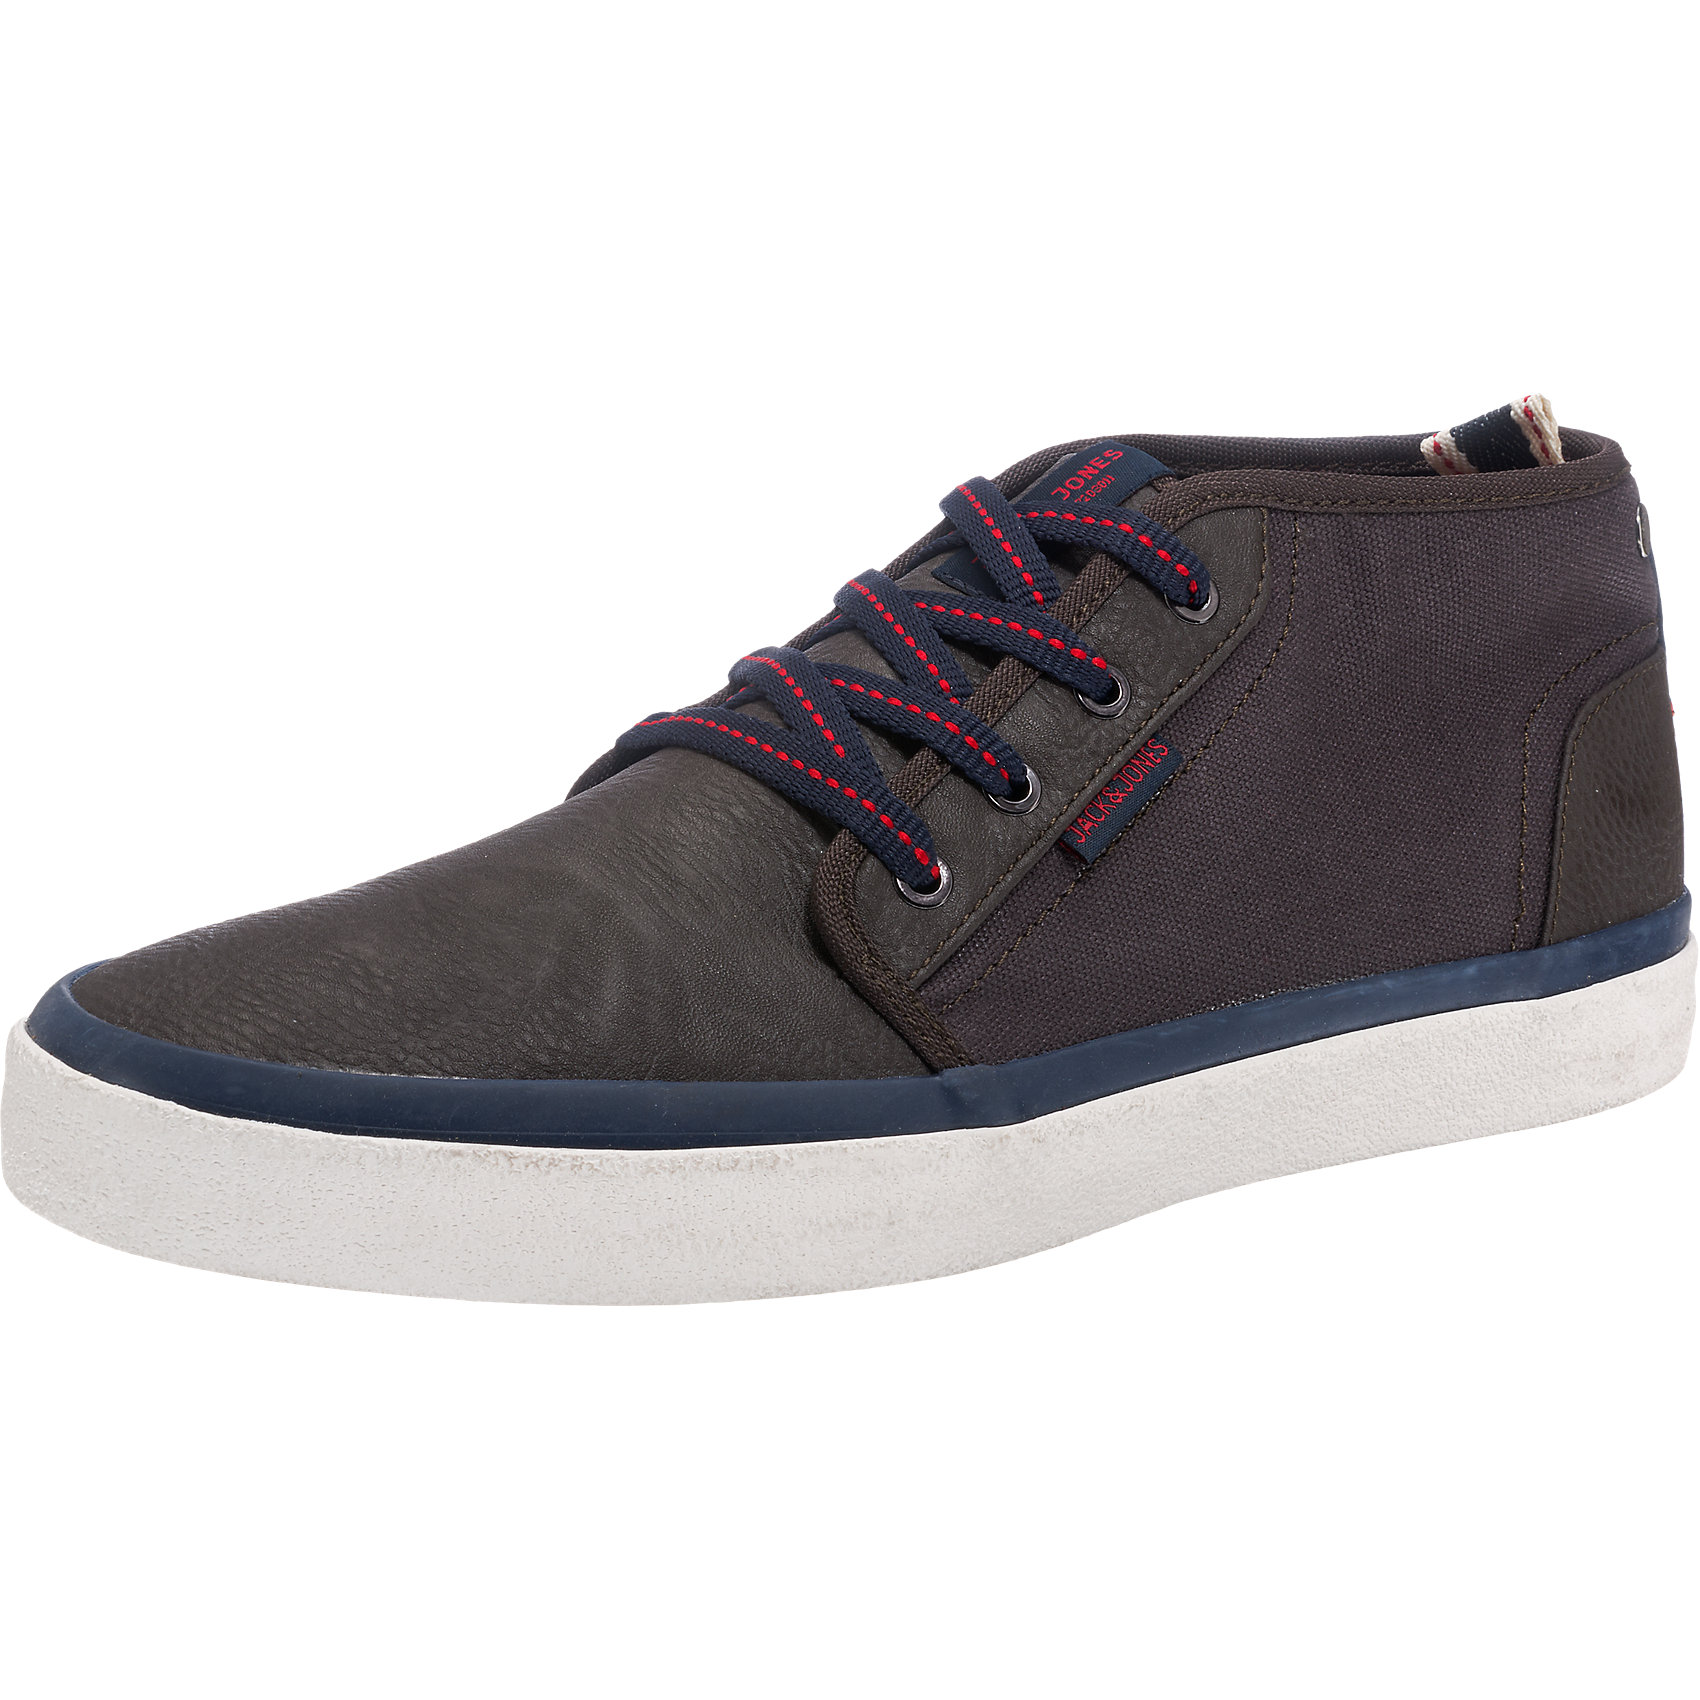 Neu JACK & JONES Major Sneakers dunkelbraun anthrazit 5761088